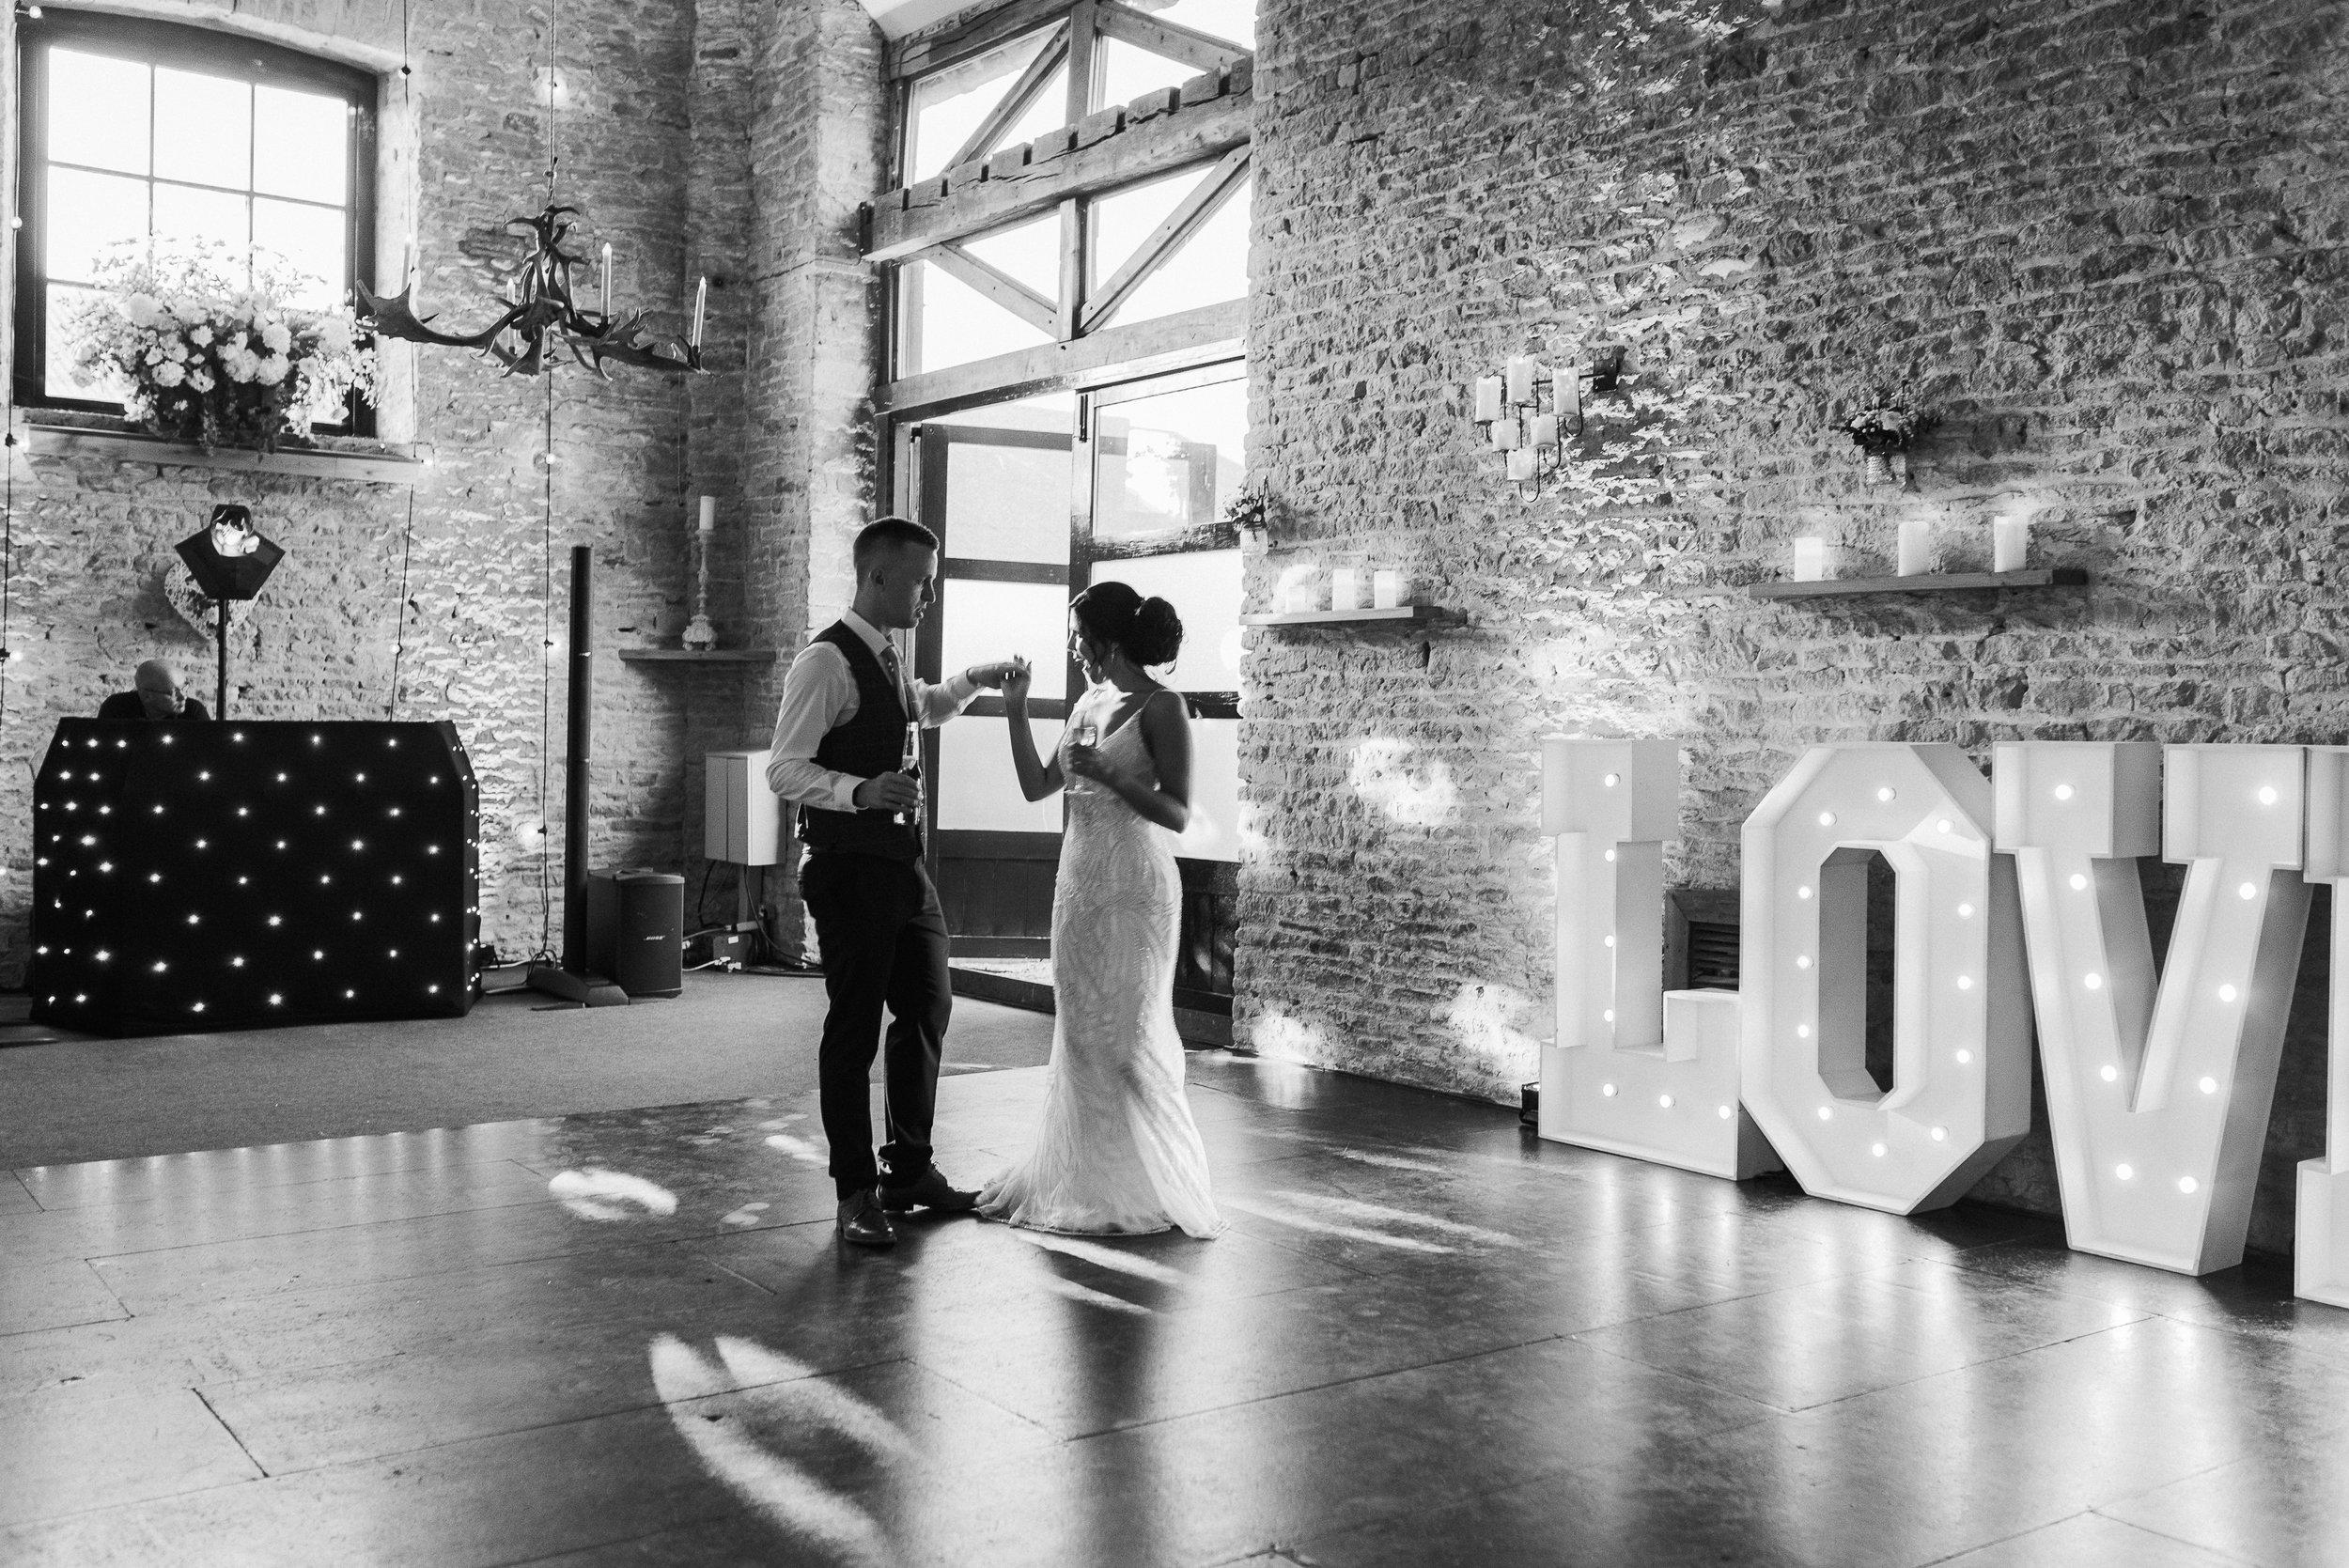 Oxfordshire-wedding-photographer-97.jpg